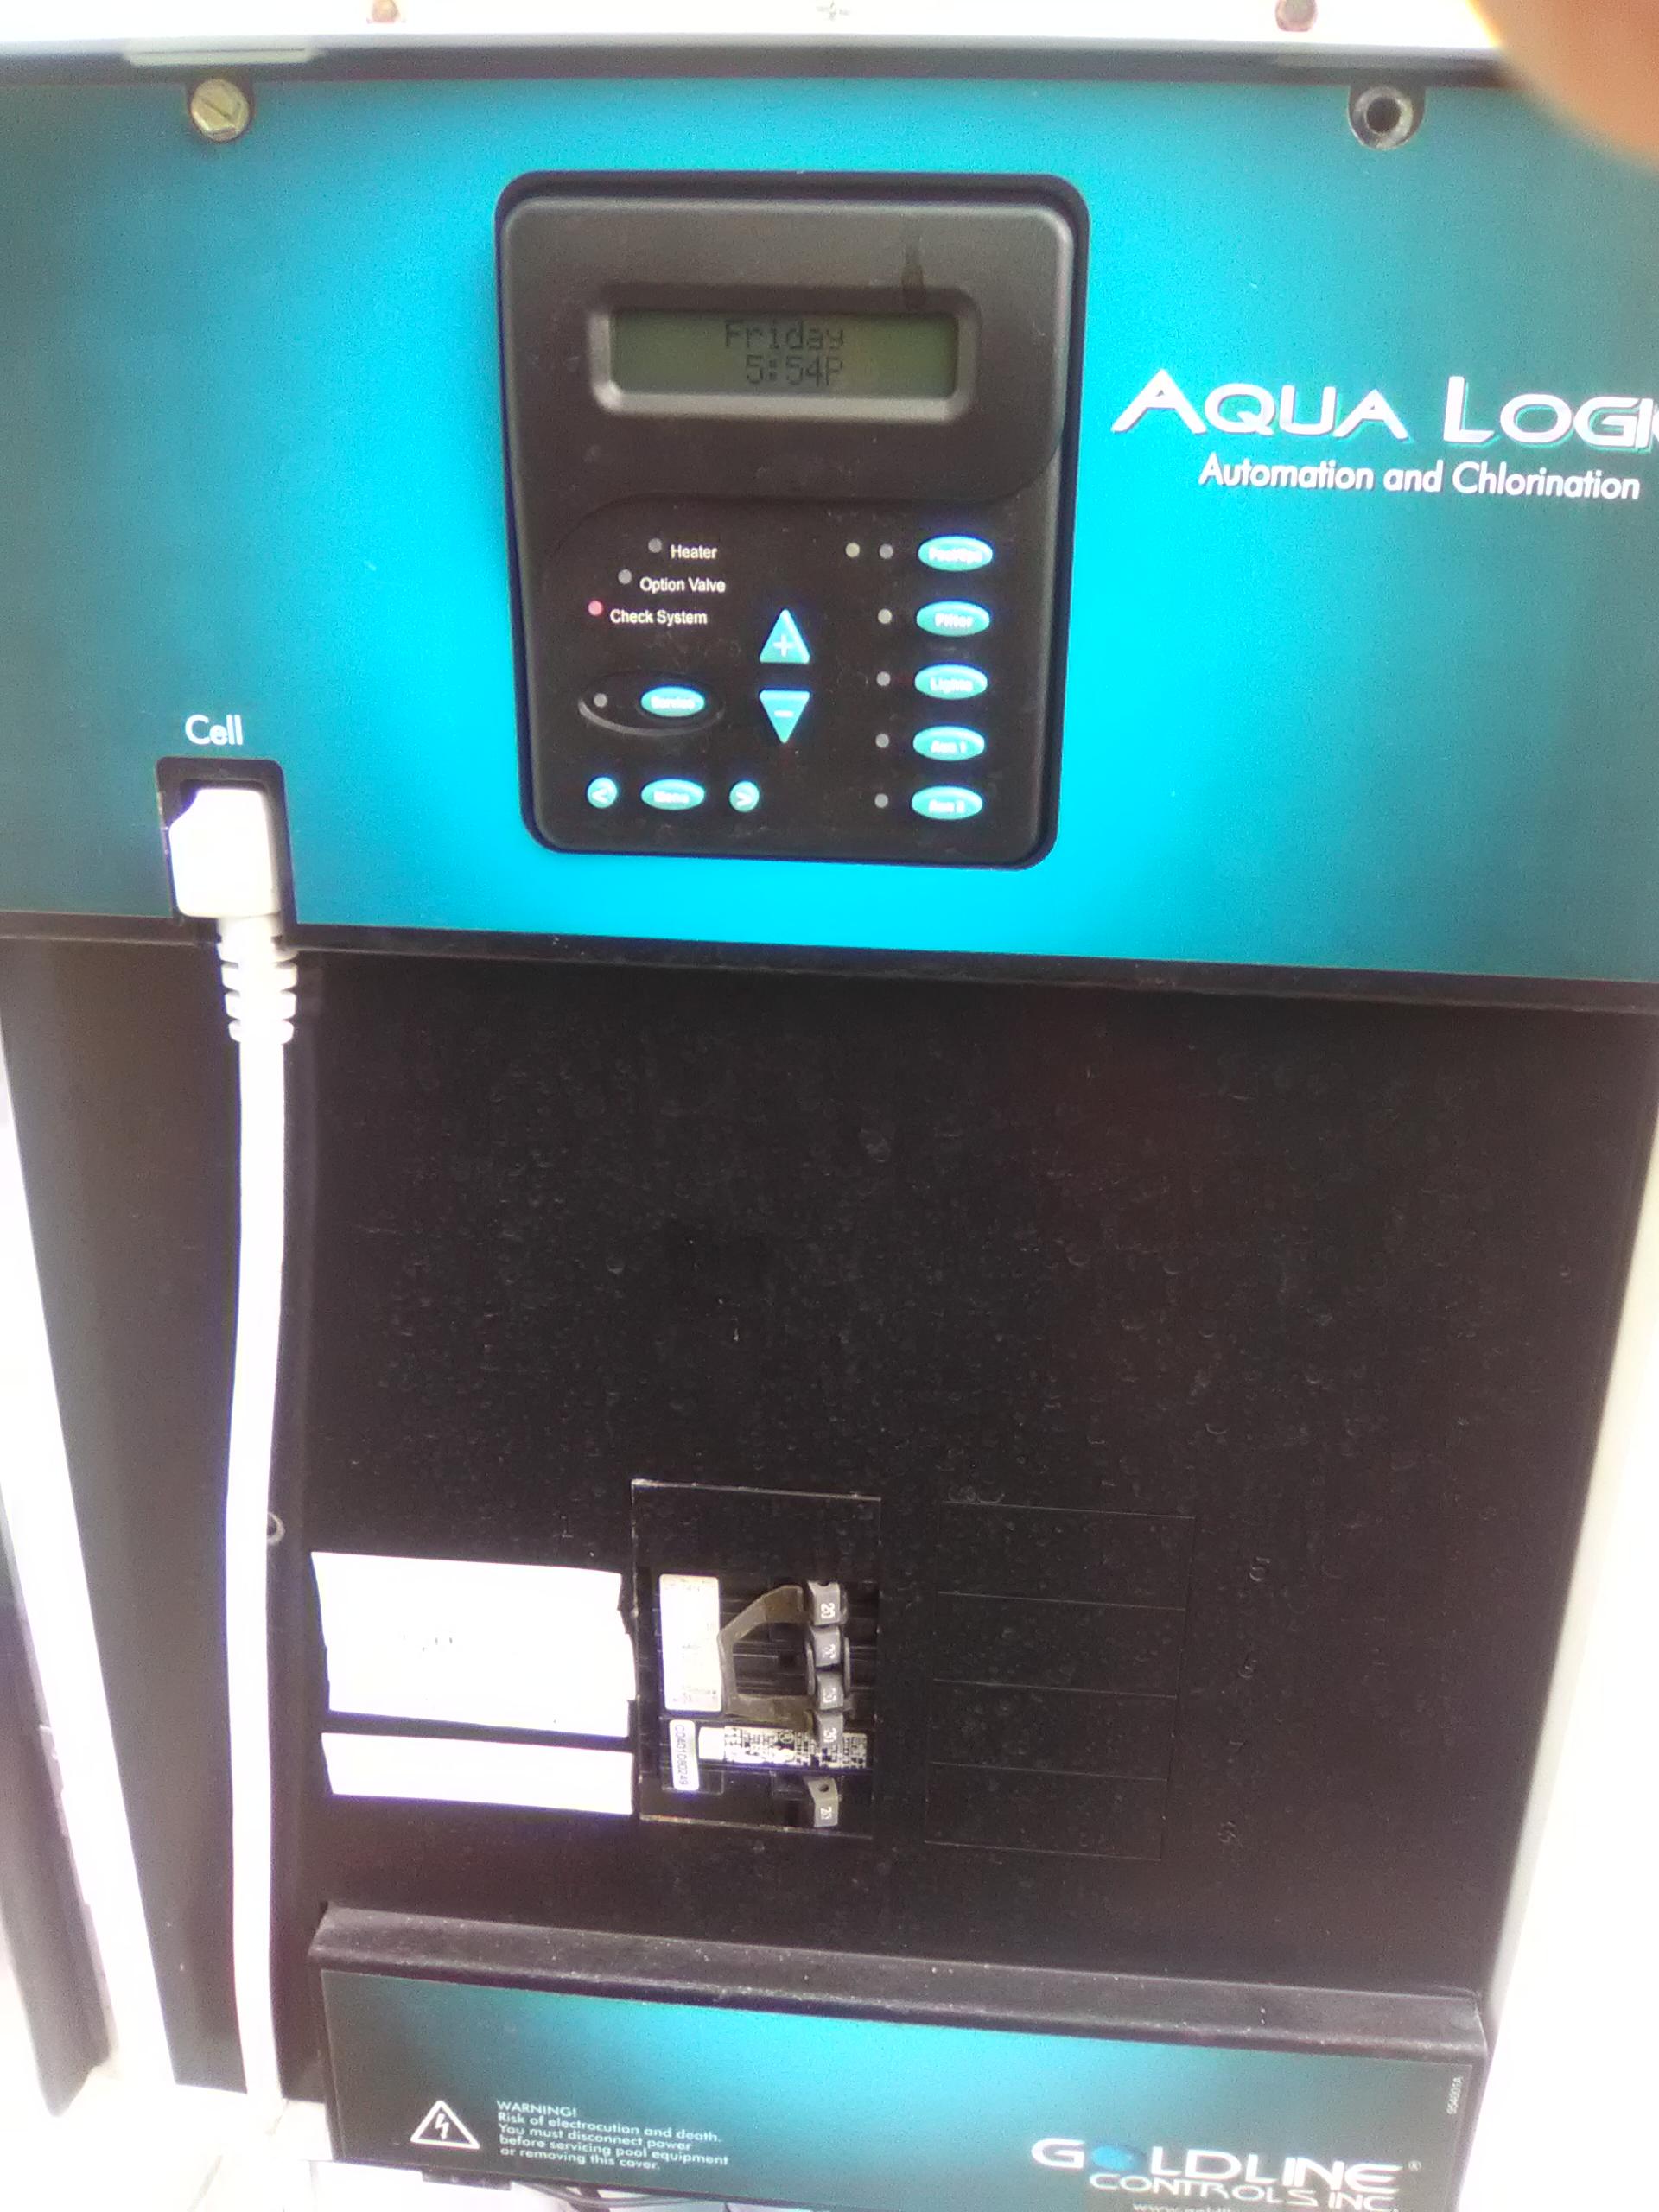 Aqua Logic Chlorinator Hayward Goldline Aqualogic Main Printed Circuit Board Glxpcbmain Will Your After Market Boards Replace Aq 1920x2560